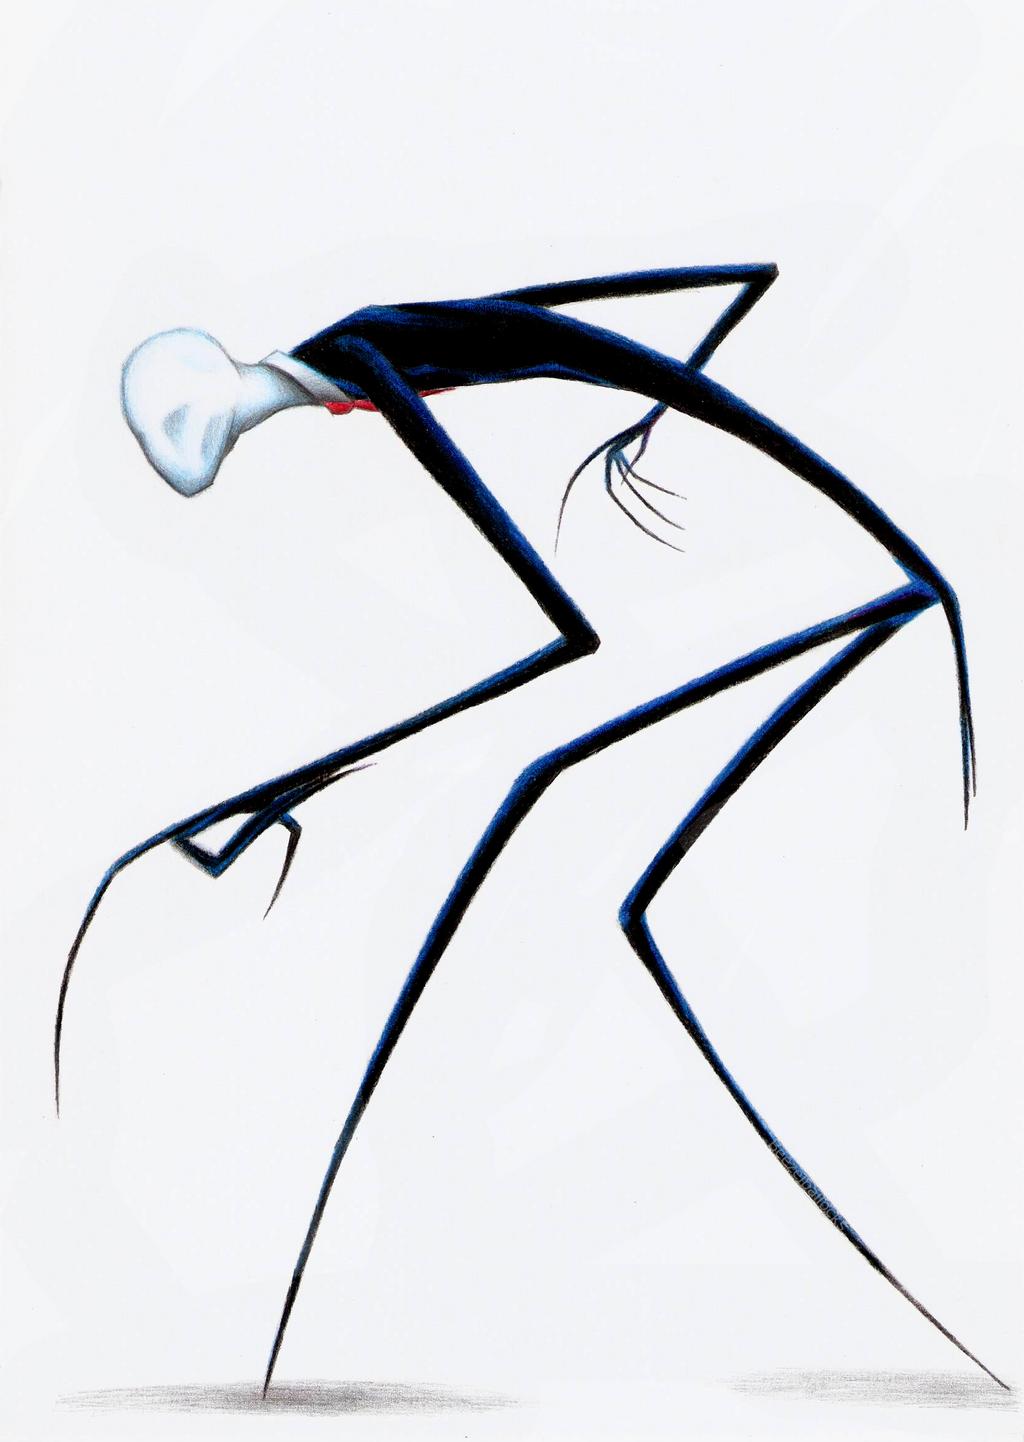 The Slender Man by Beezelballocks